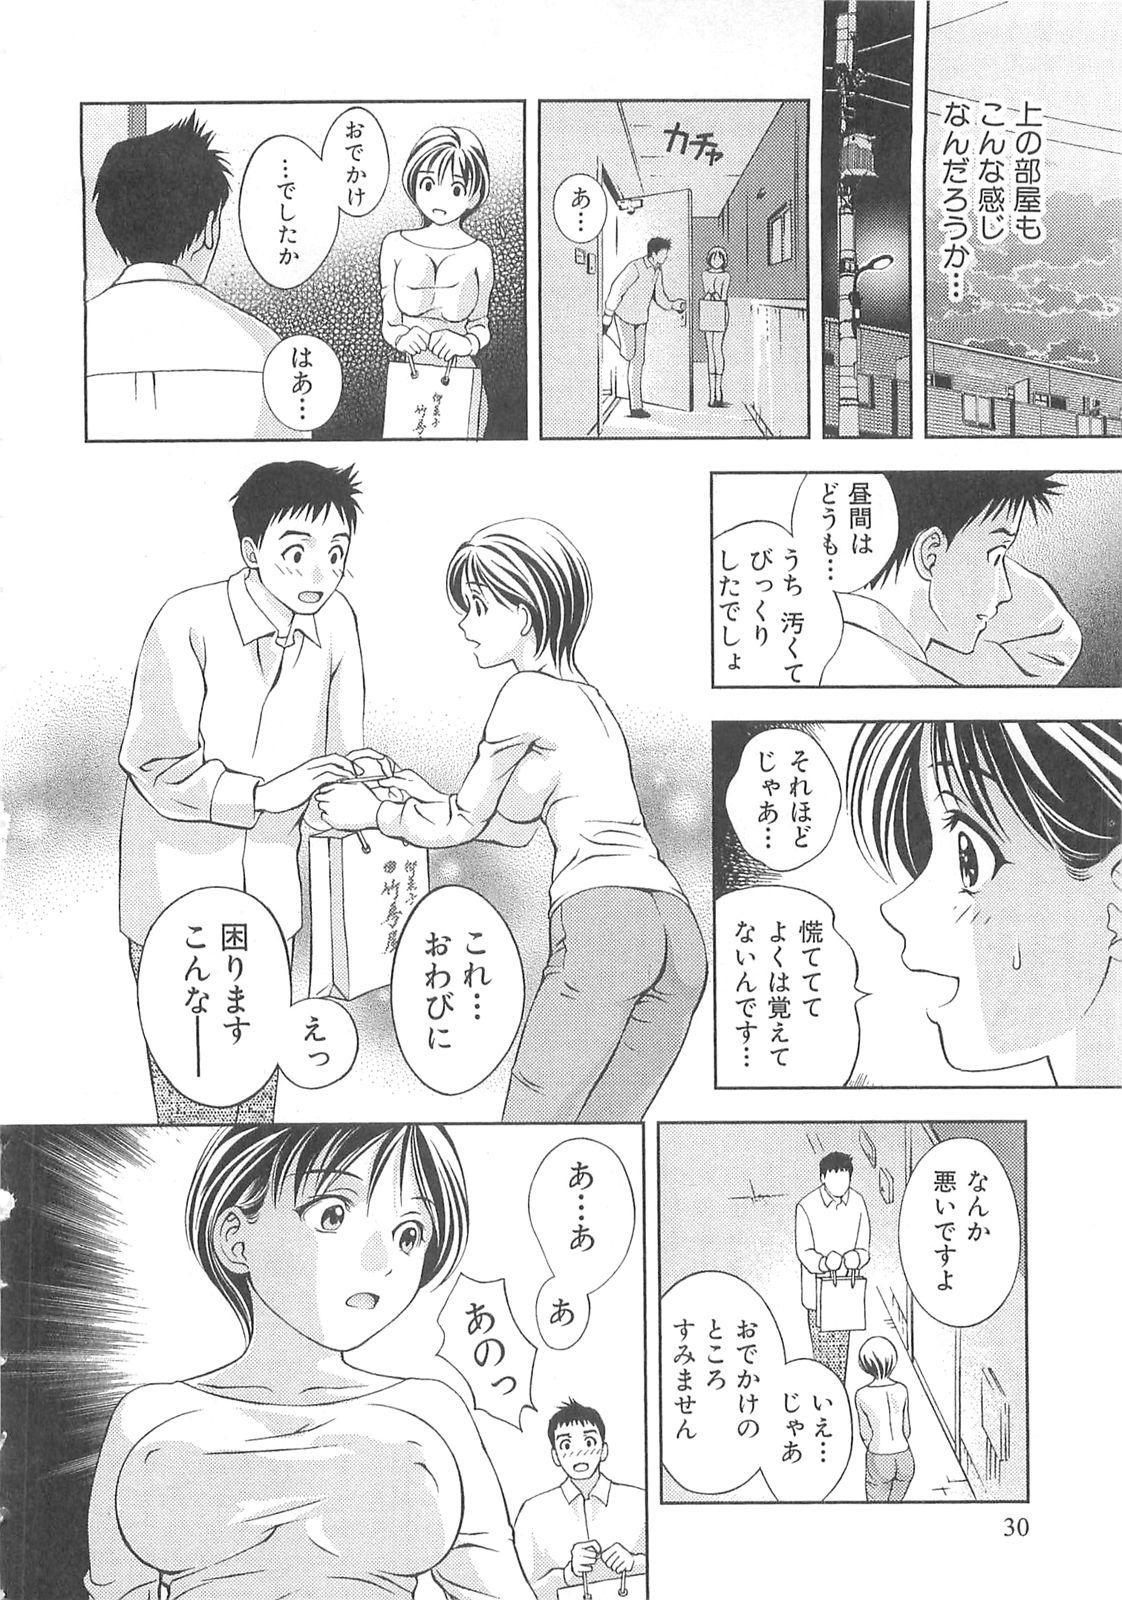 Tenshi no Kyuu - Angel's Pretty Hip 30